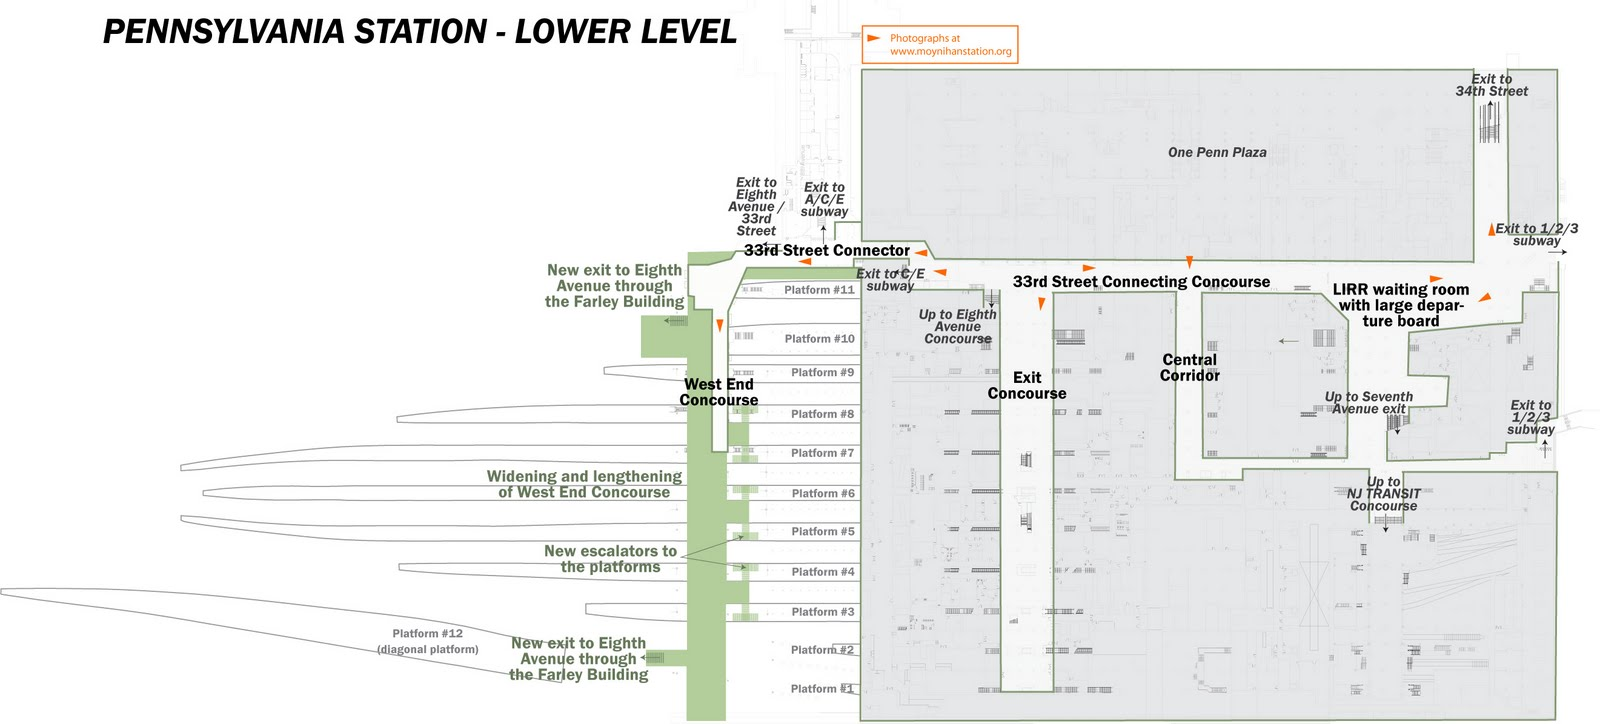 penn station pathfinder current floor plans 2010